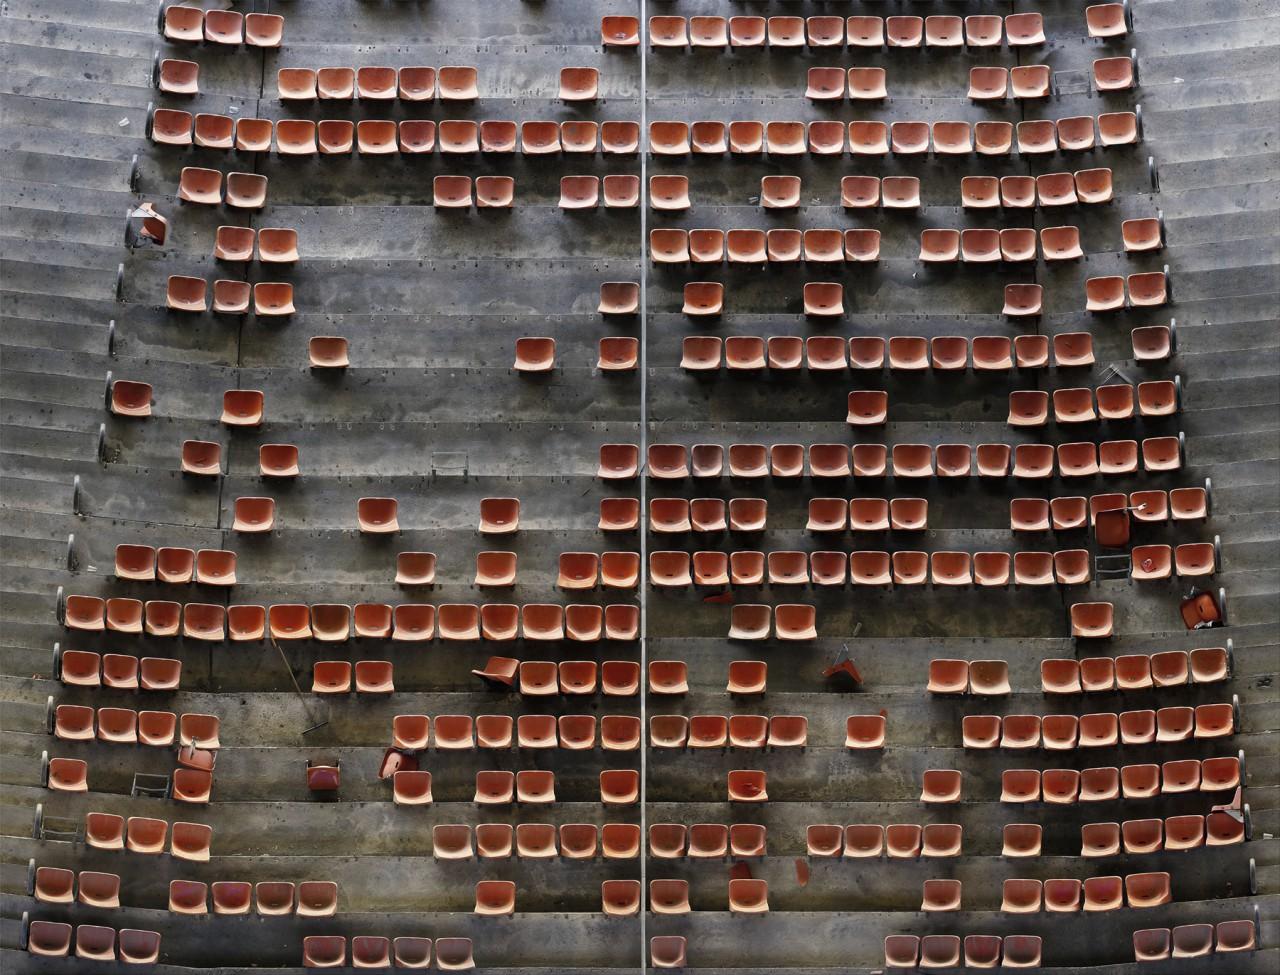 Supervisions - Ohne Titel Stadion) | Düsseldorf 2002 | Lightjet print | 170 x 222 cm